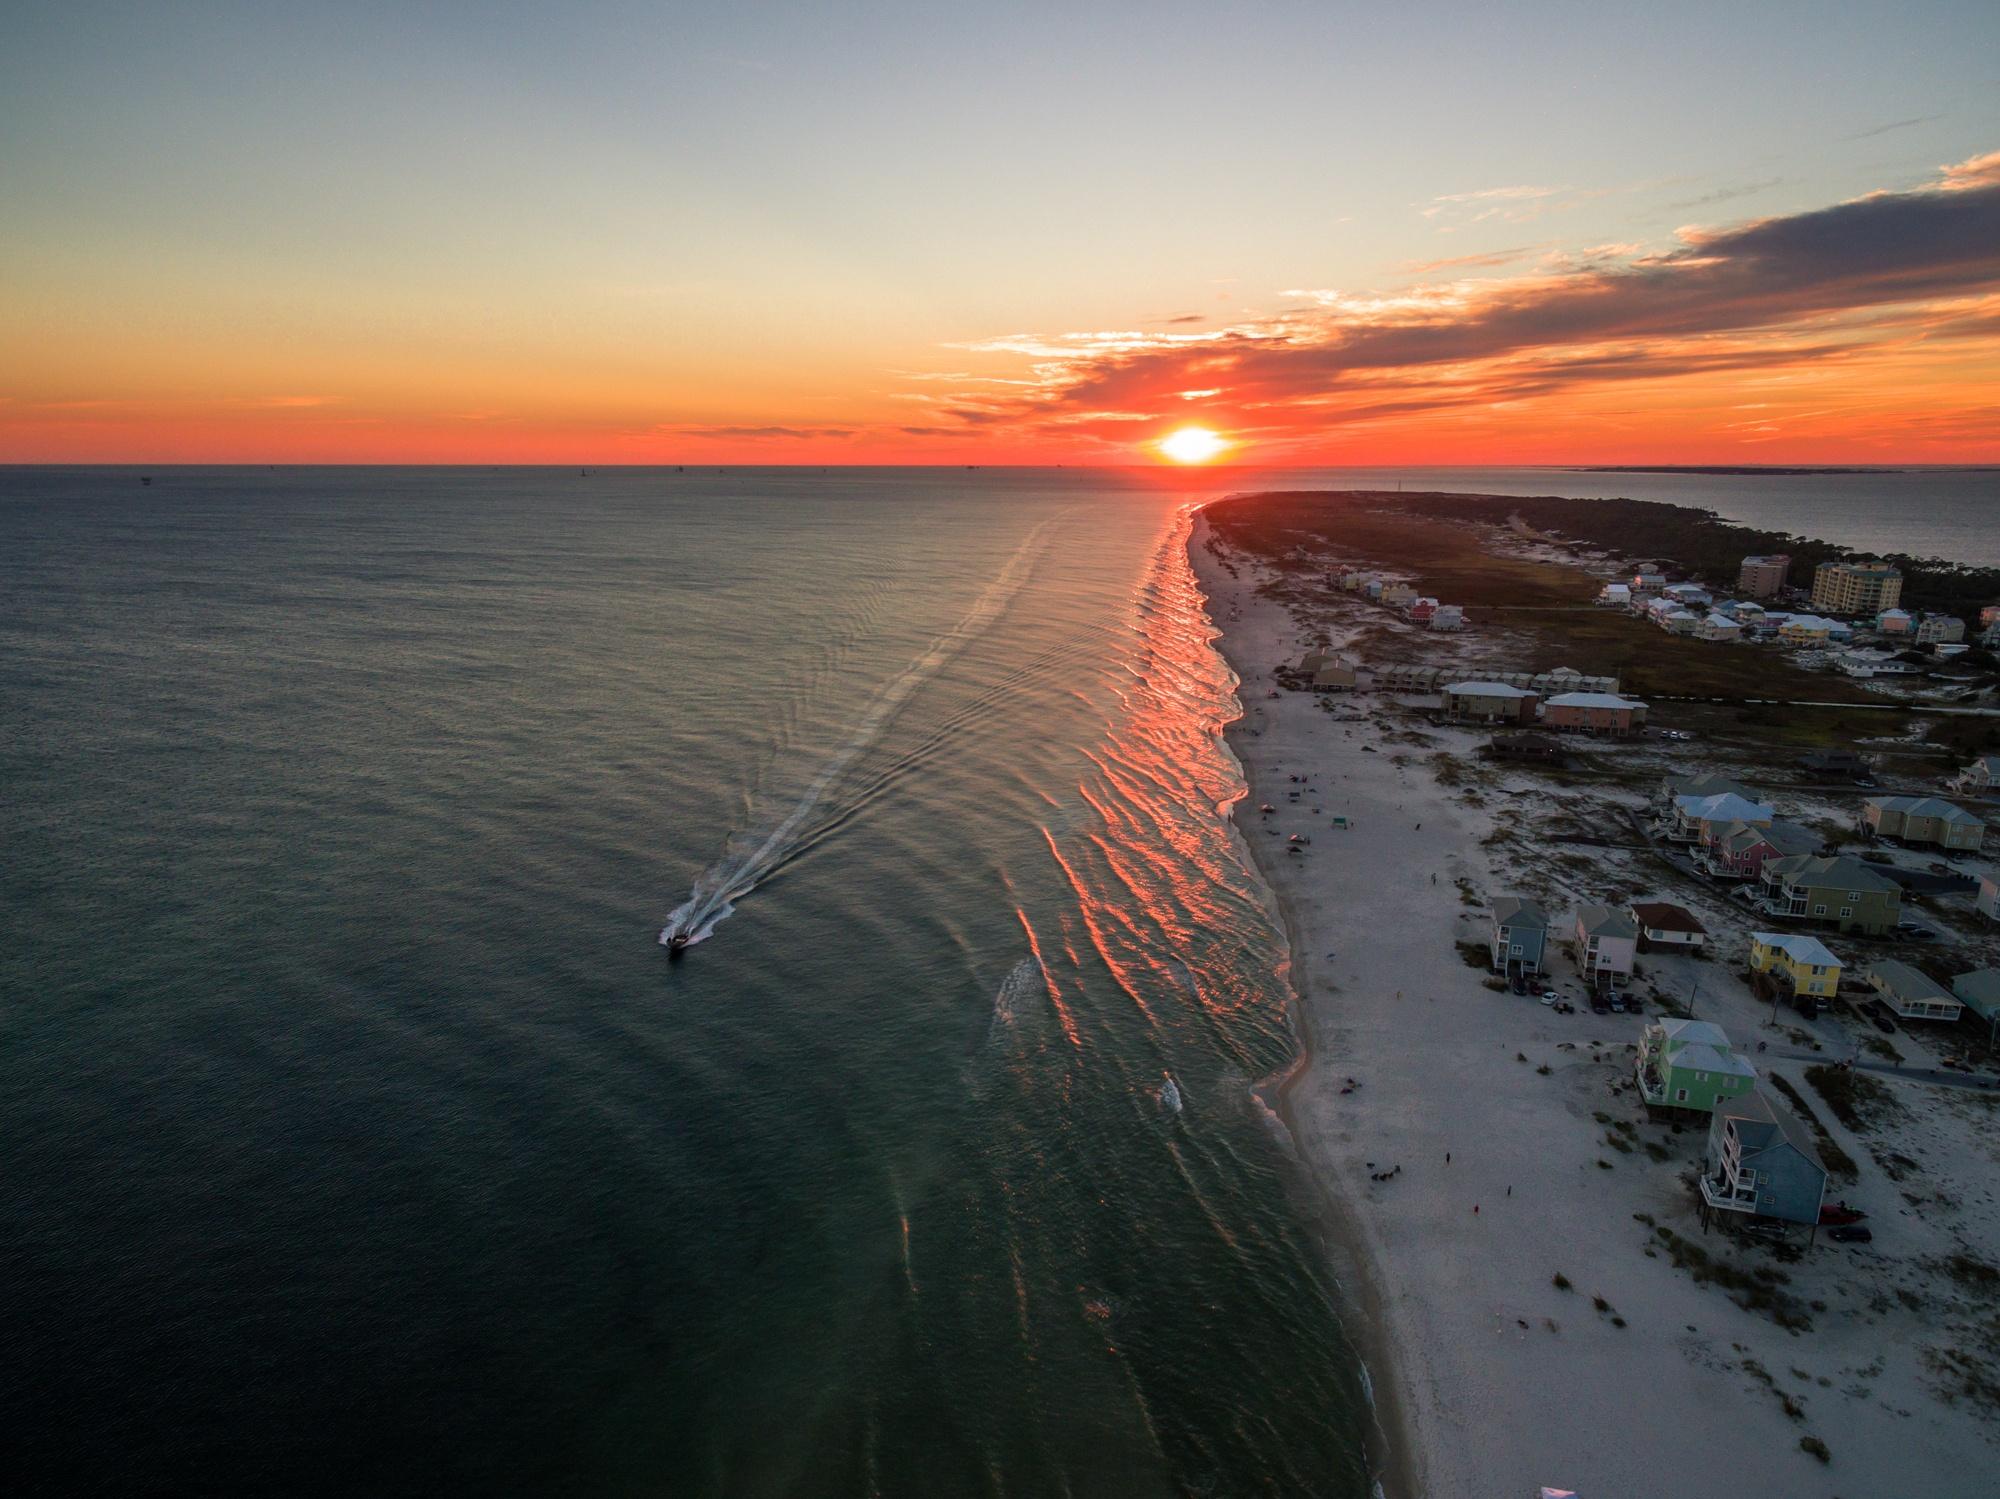 Gulf Shores, Alabama